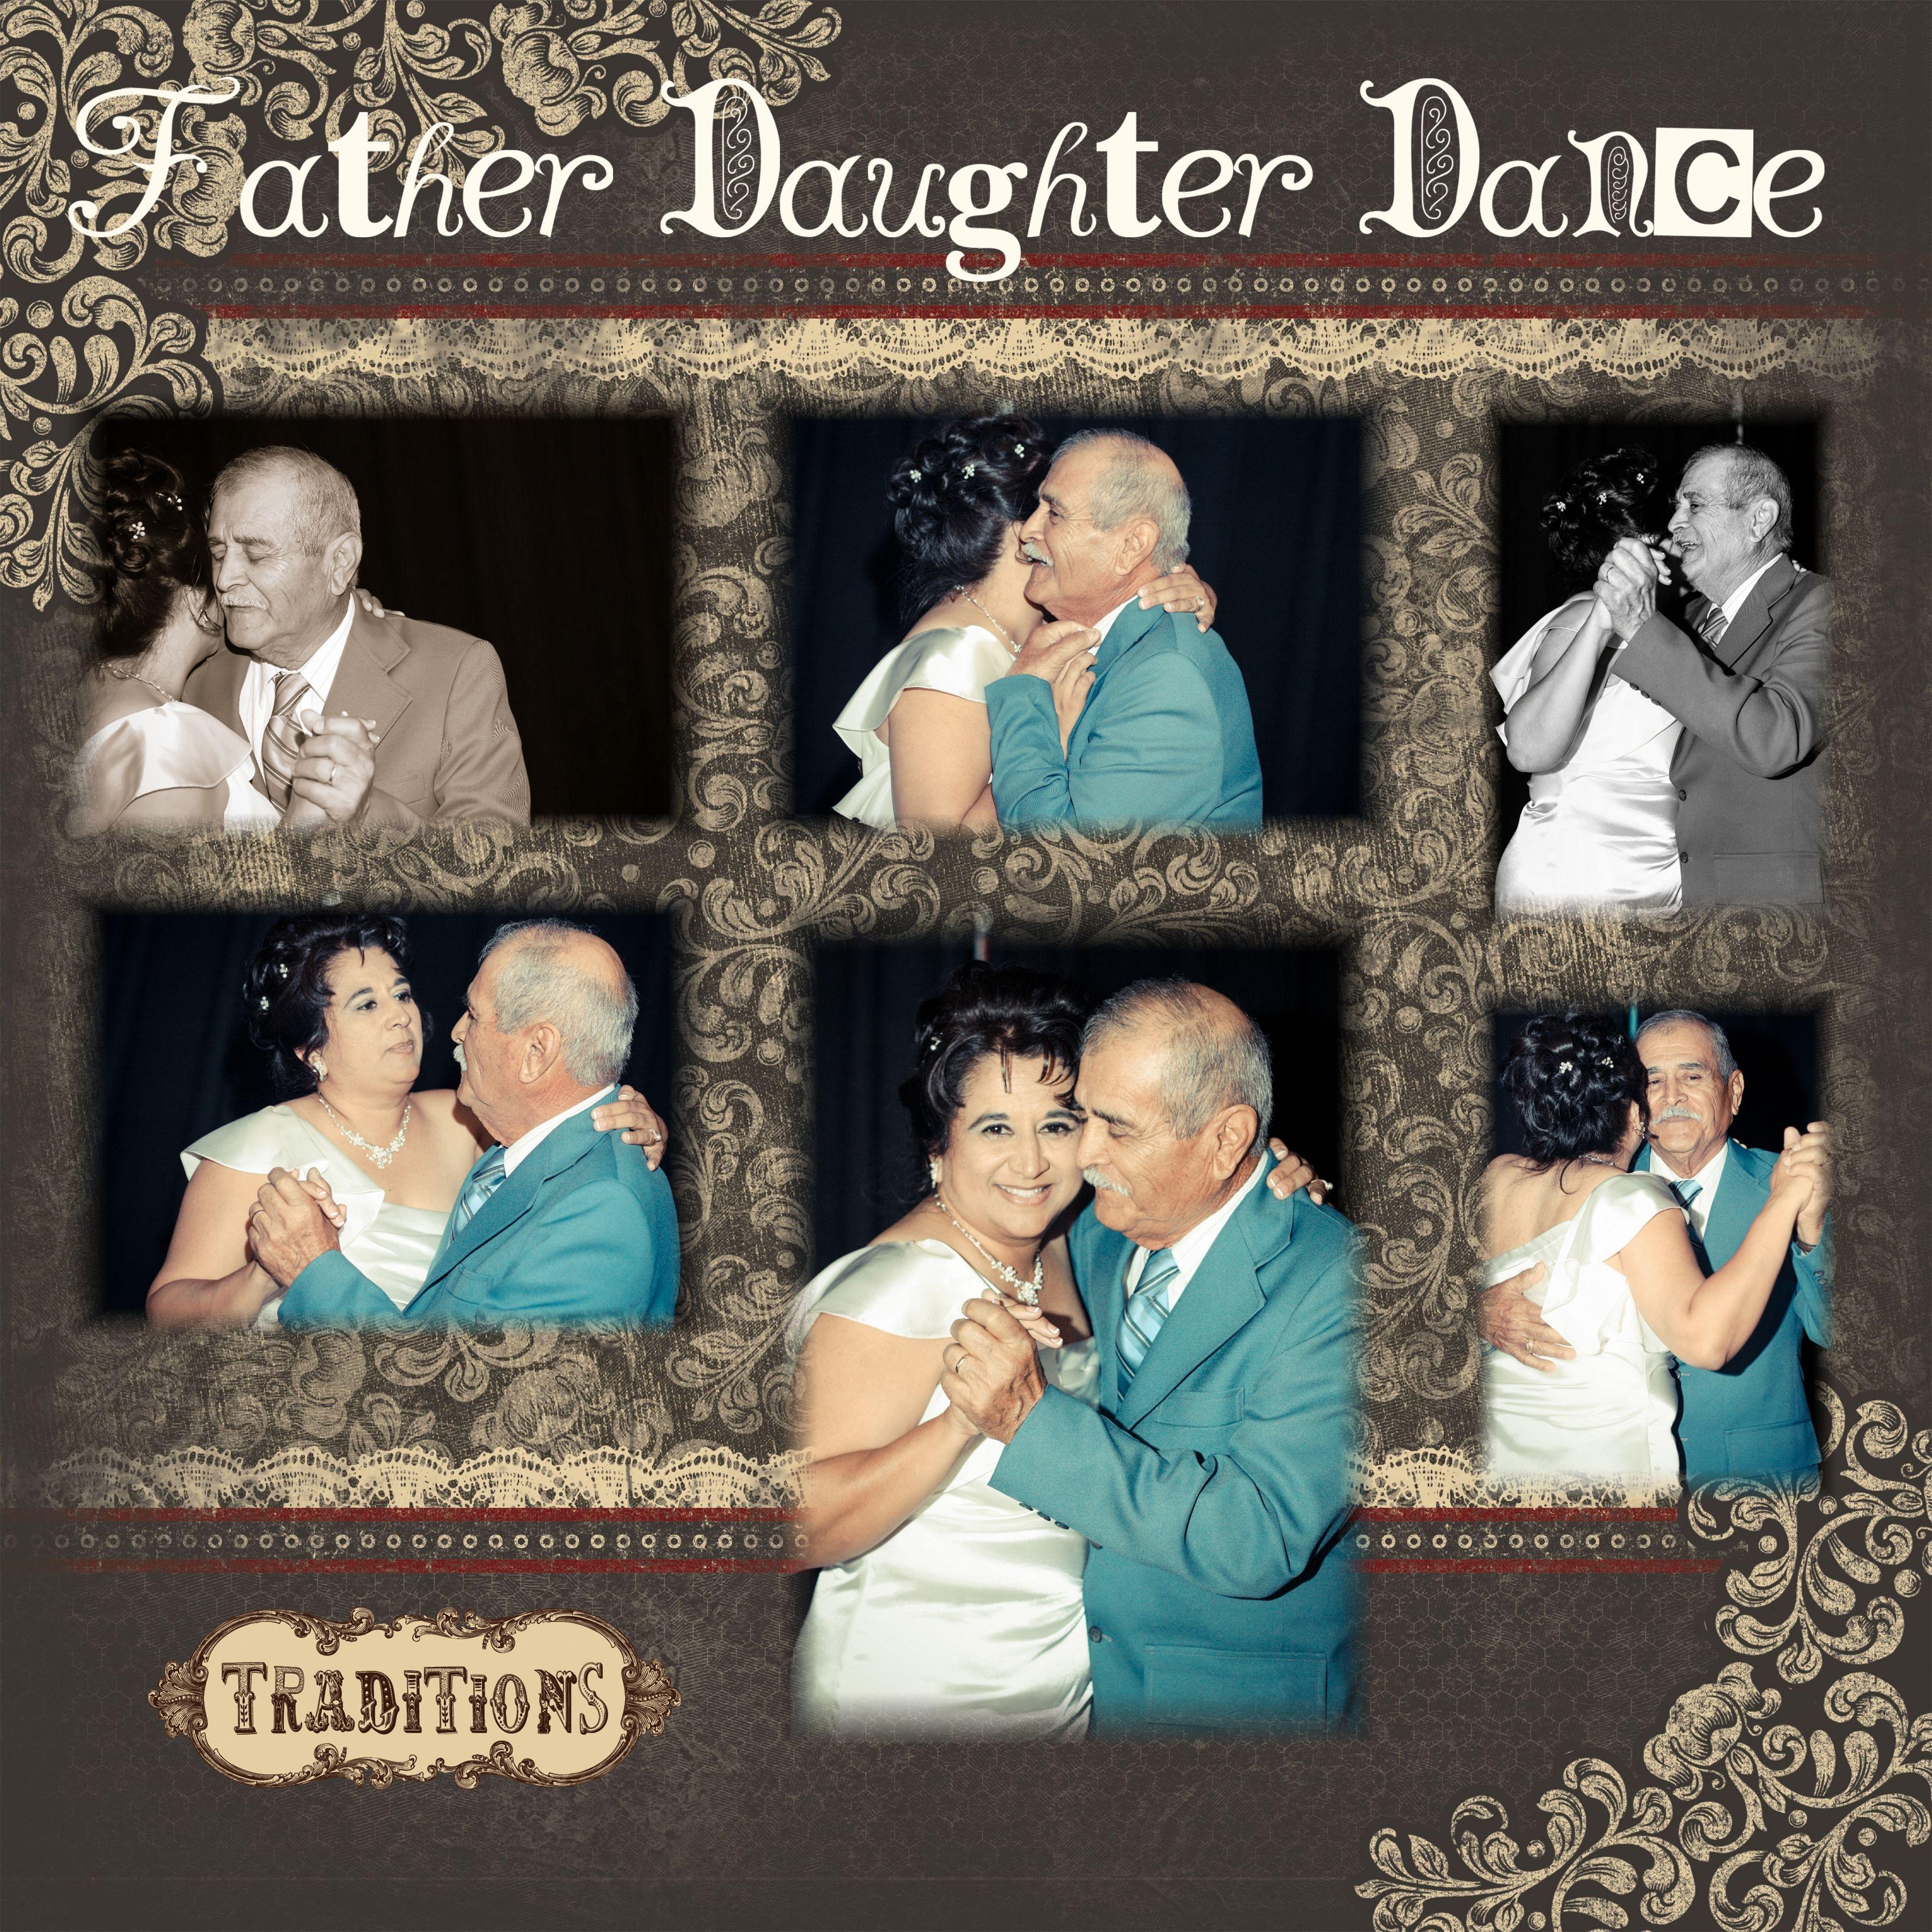 Father Daughter Wedding Dance: Lorraine's Scrapbooking Fun